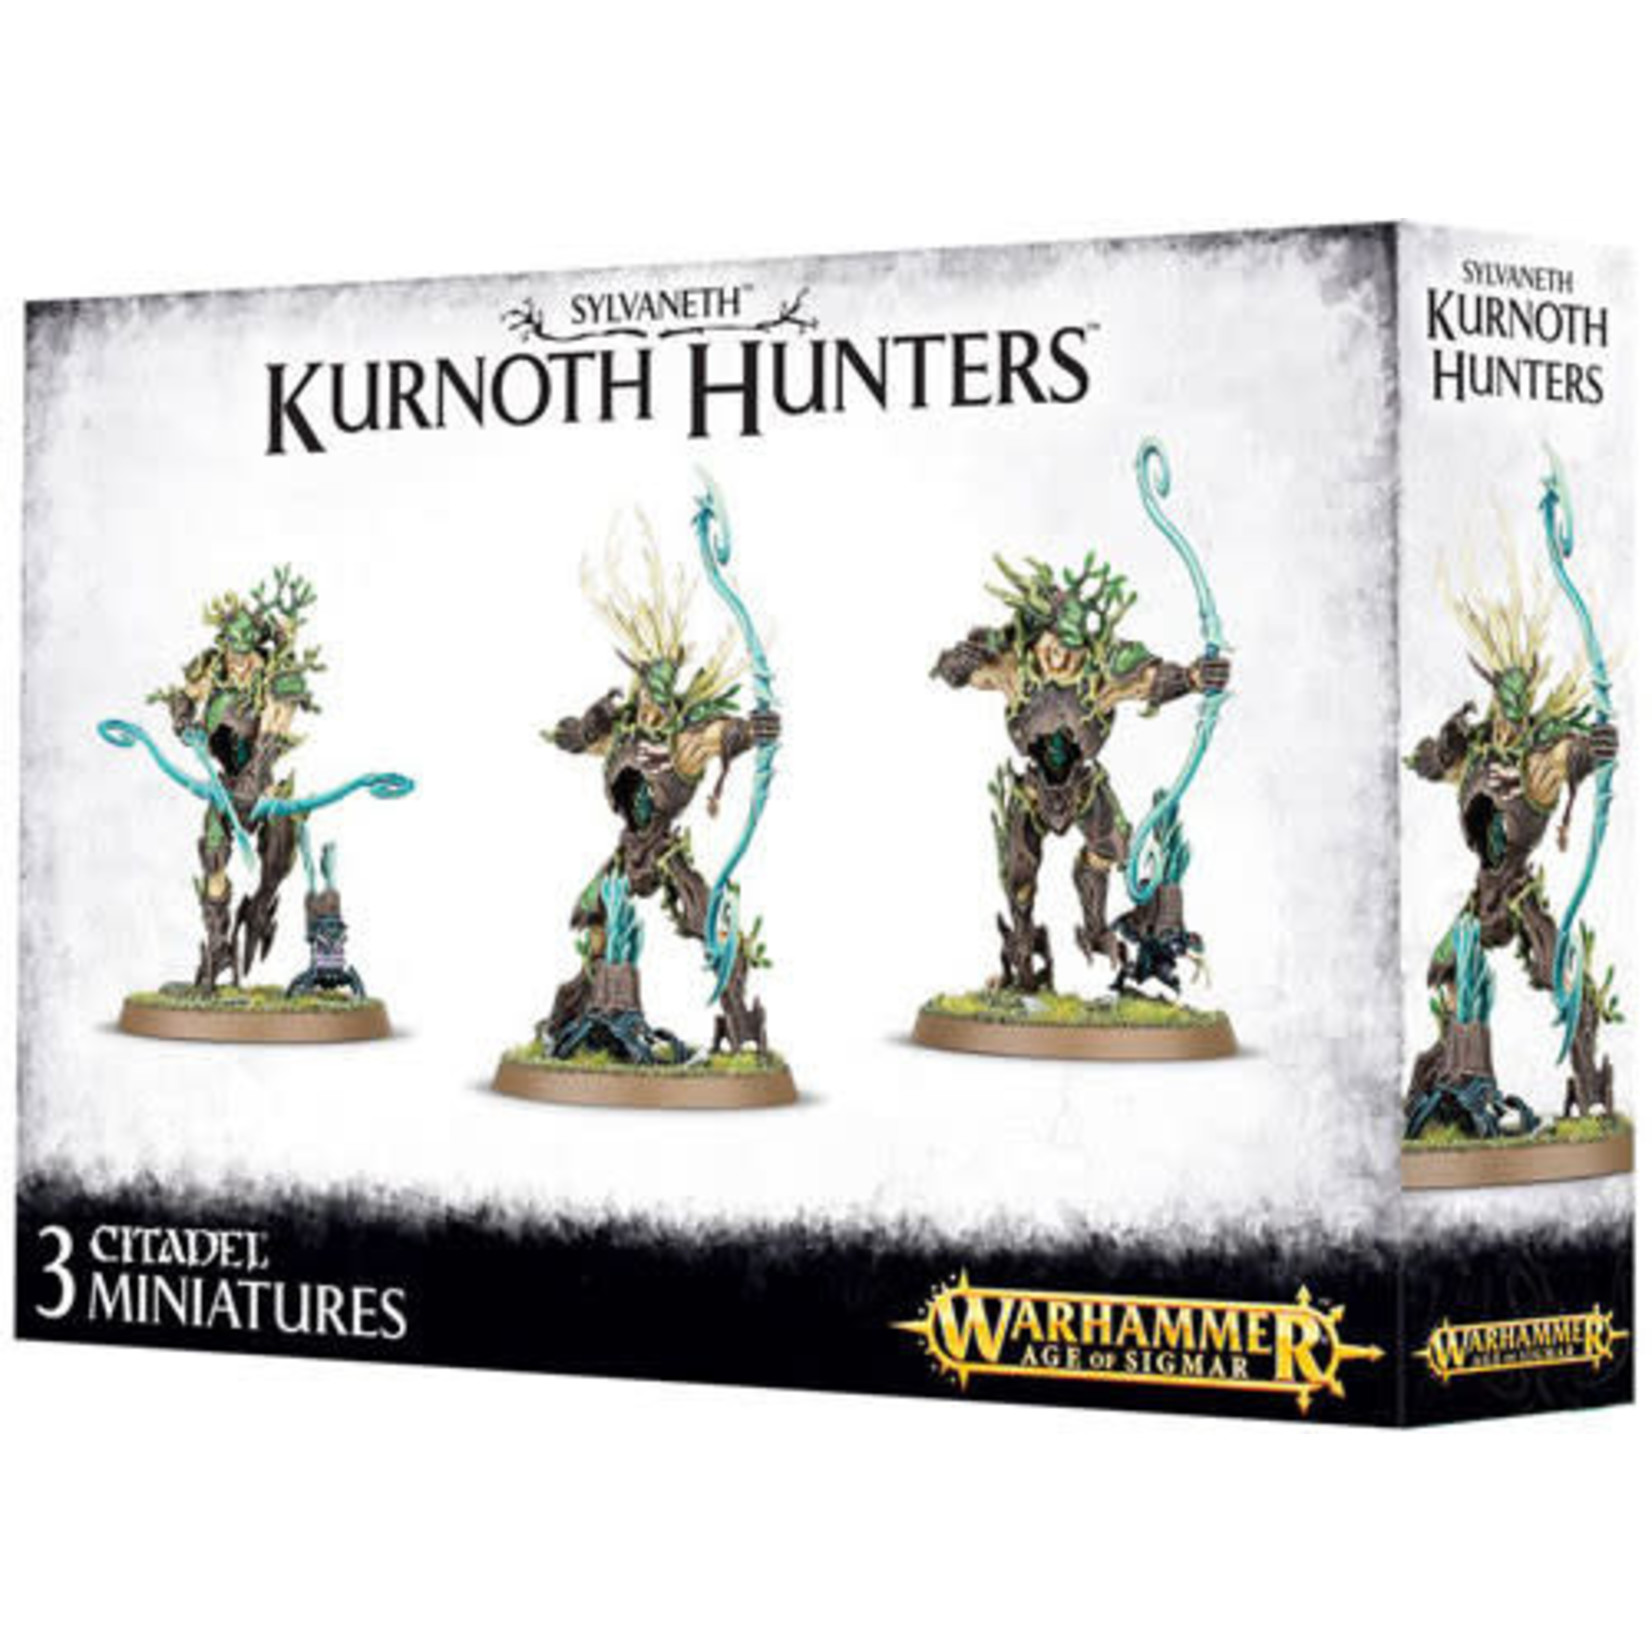 Games Workshop Warhammer AoS: Sylvaneth Kurnoth Hunters